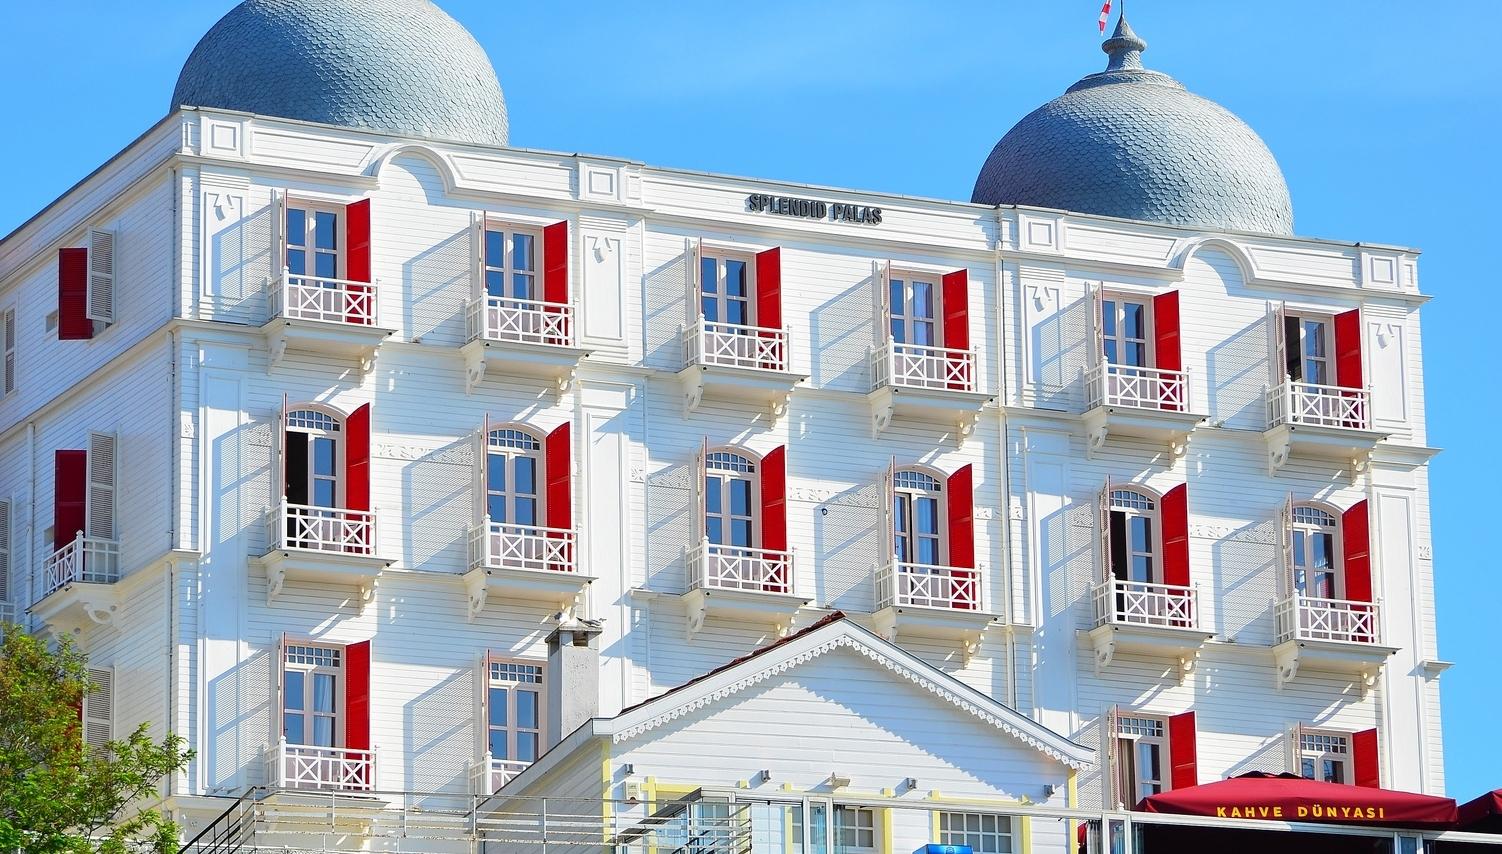 Splendid+Palace+Hotel.jpg